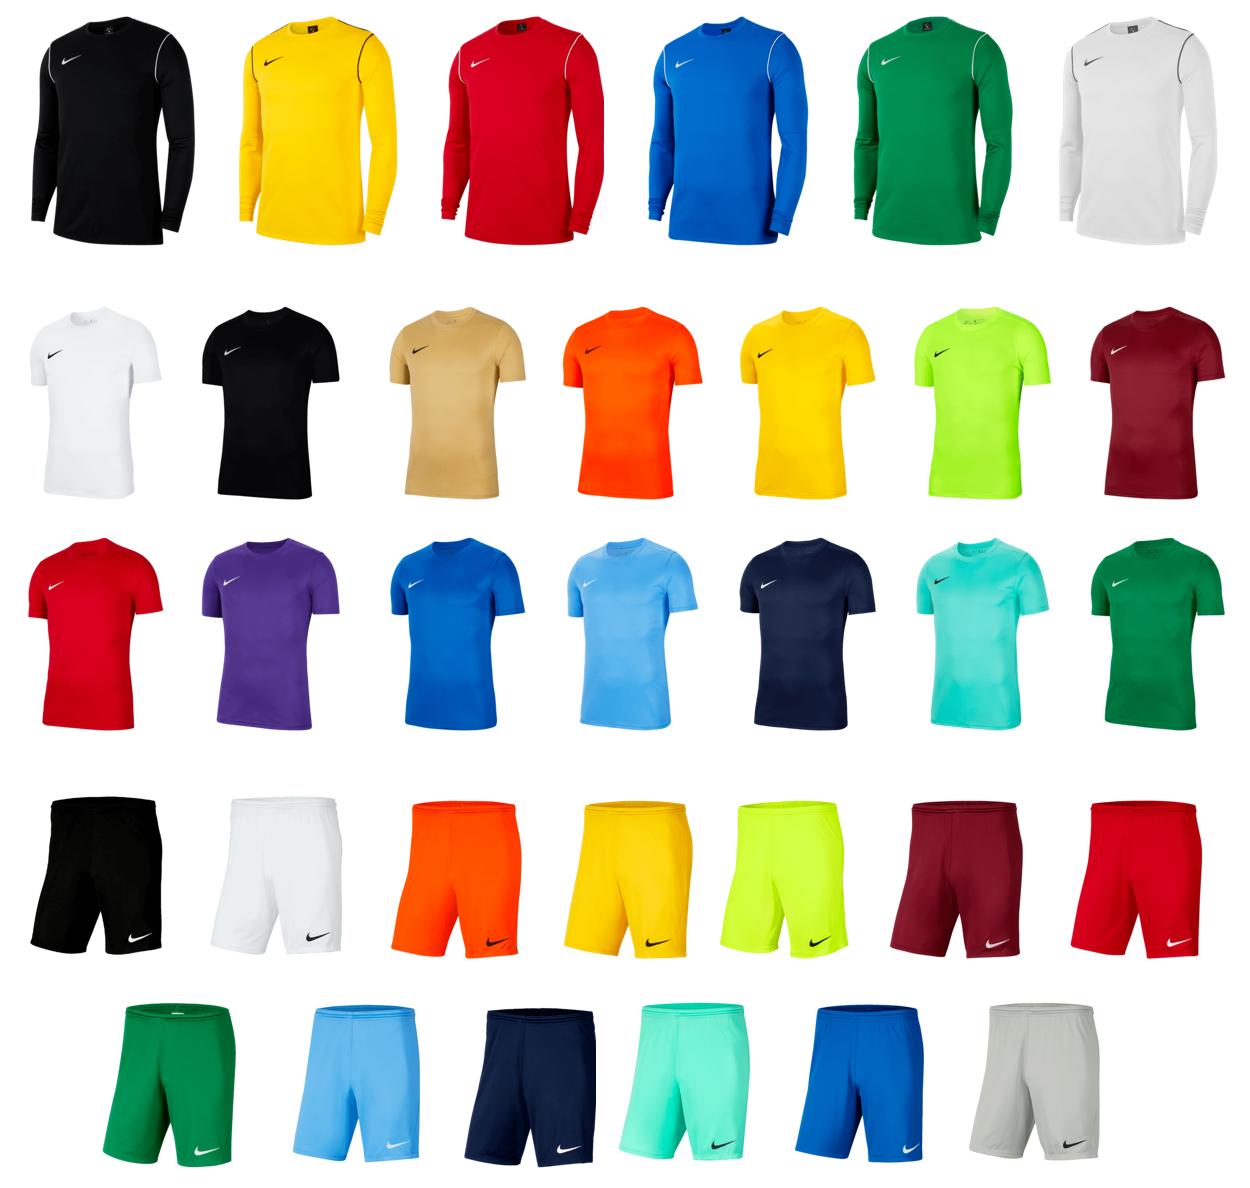 Nike Park Set (1 shirt, 1 t-shirt en 1 short) voor €36,95 - kies&mix